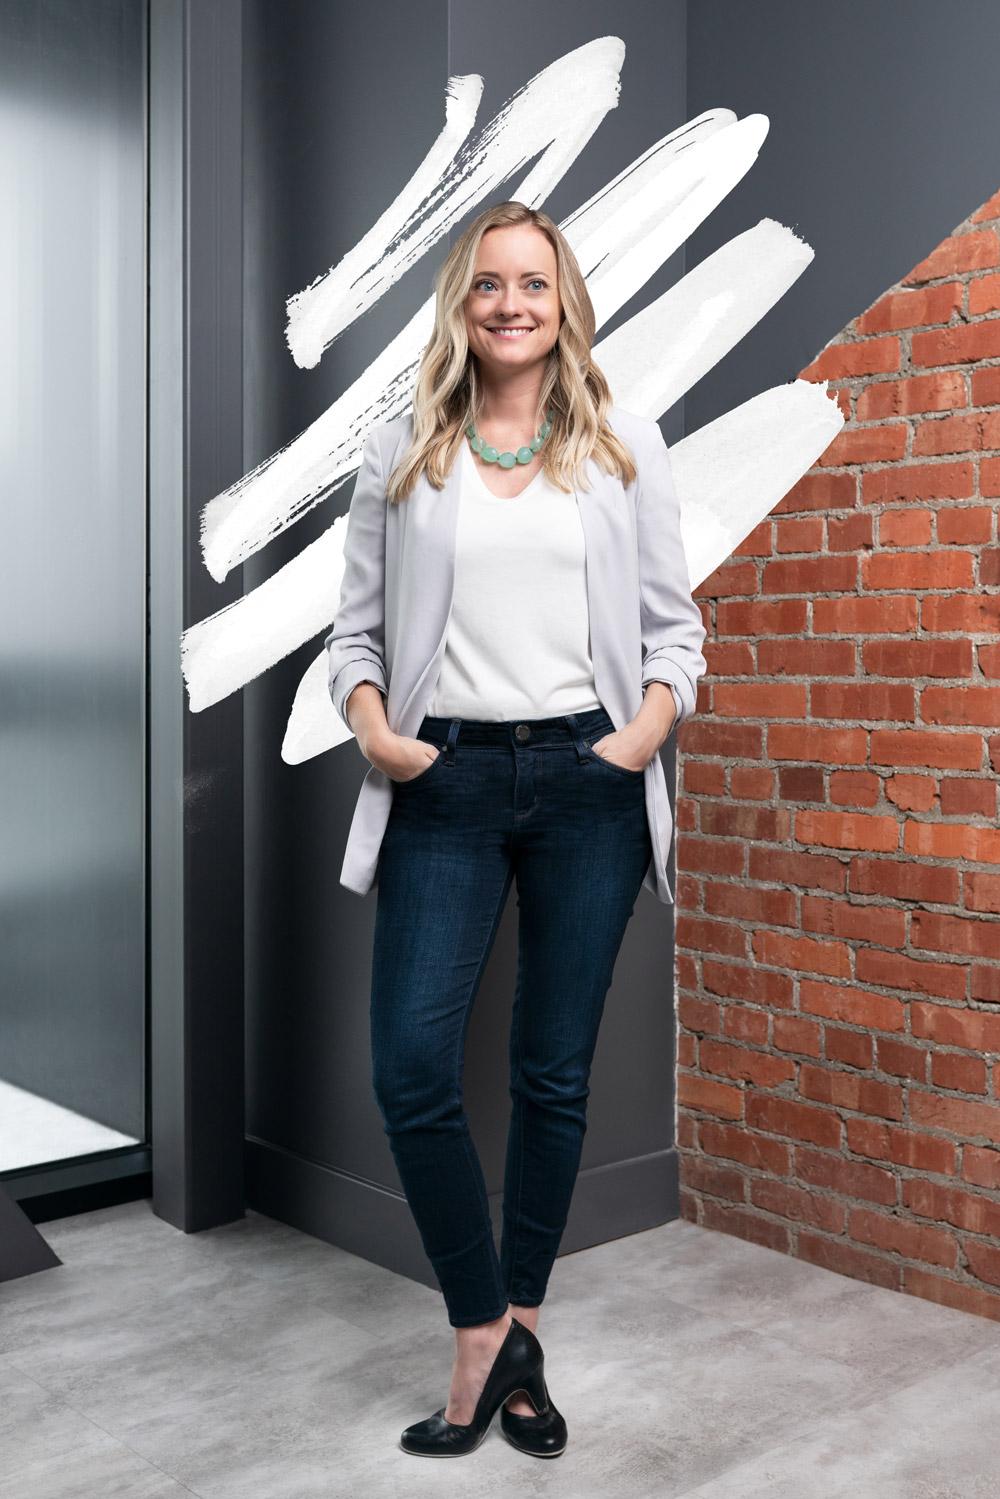 Kylie-Henry-Graphic-Designer-Calgary